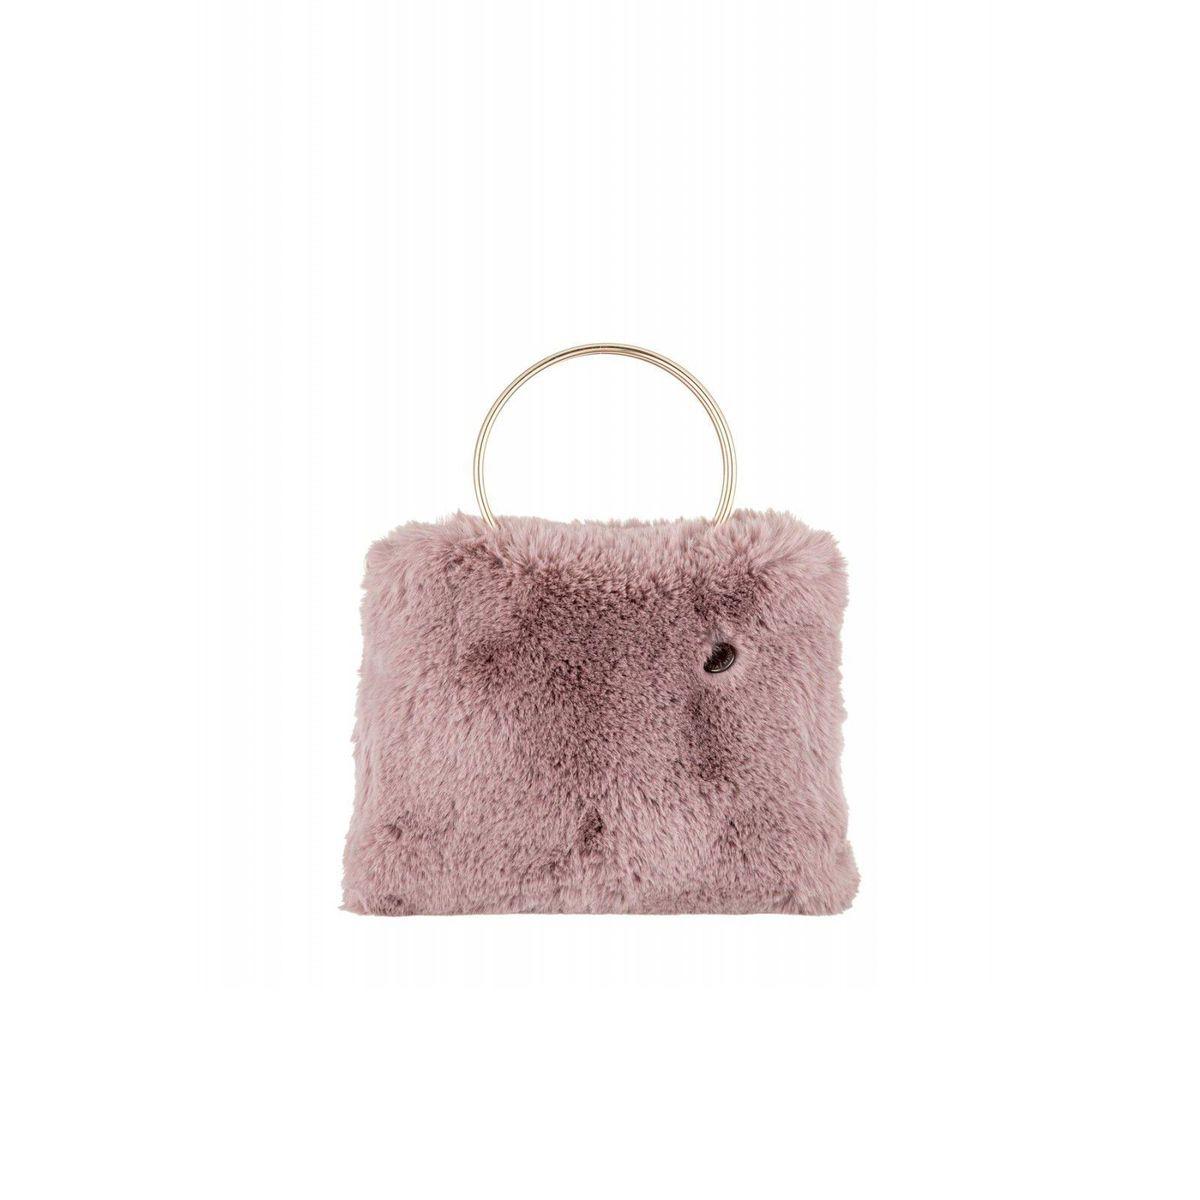 STYLE9000 BAG Pink Alessia Massimo